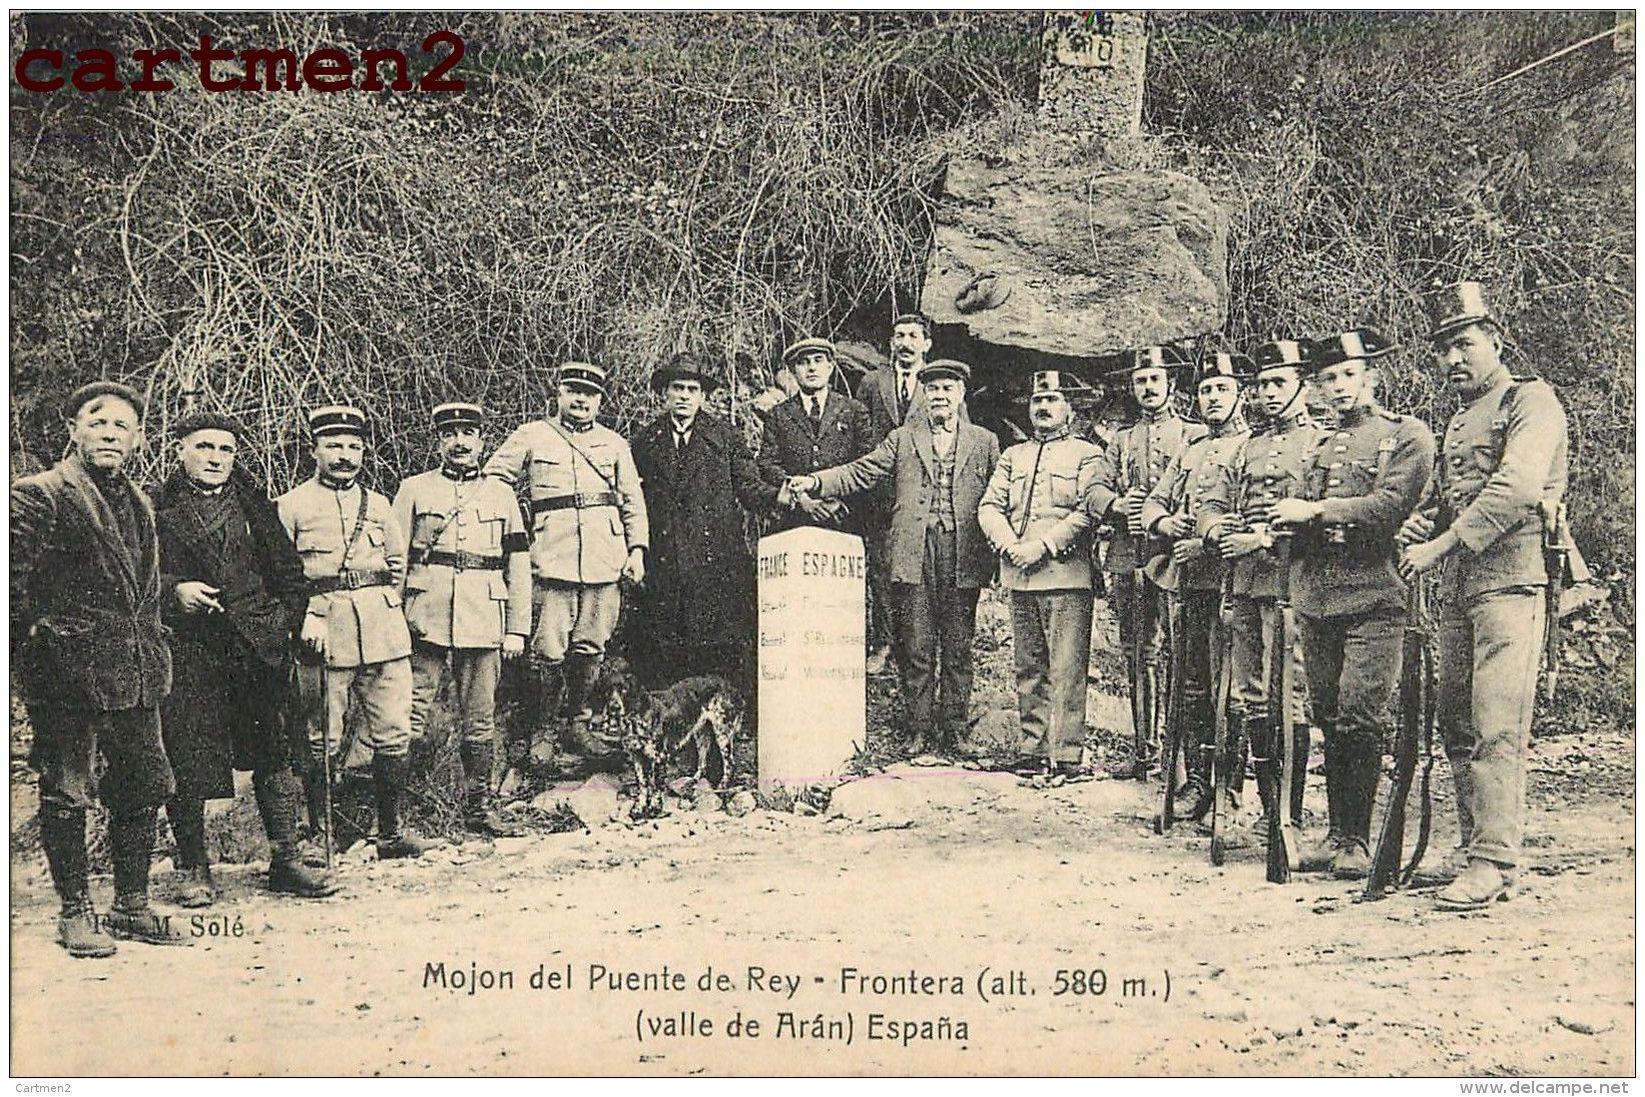 VALLE DE ARAN MOJON DEL PUENTE DE REY FRONTERA DOUANE DOUANIERS ESPANA PYRENEES CATALUNA - España